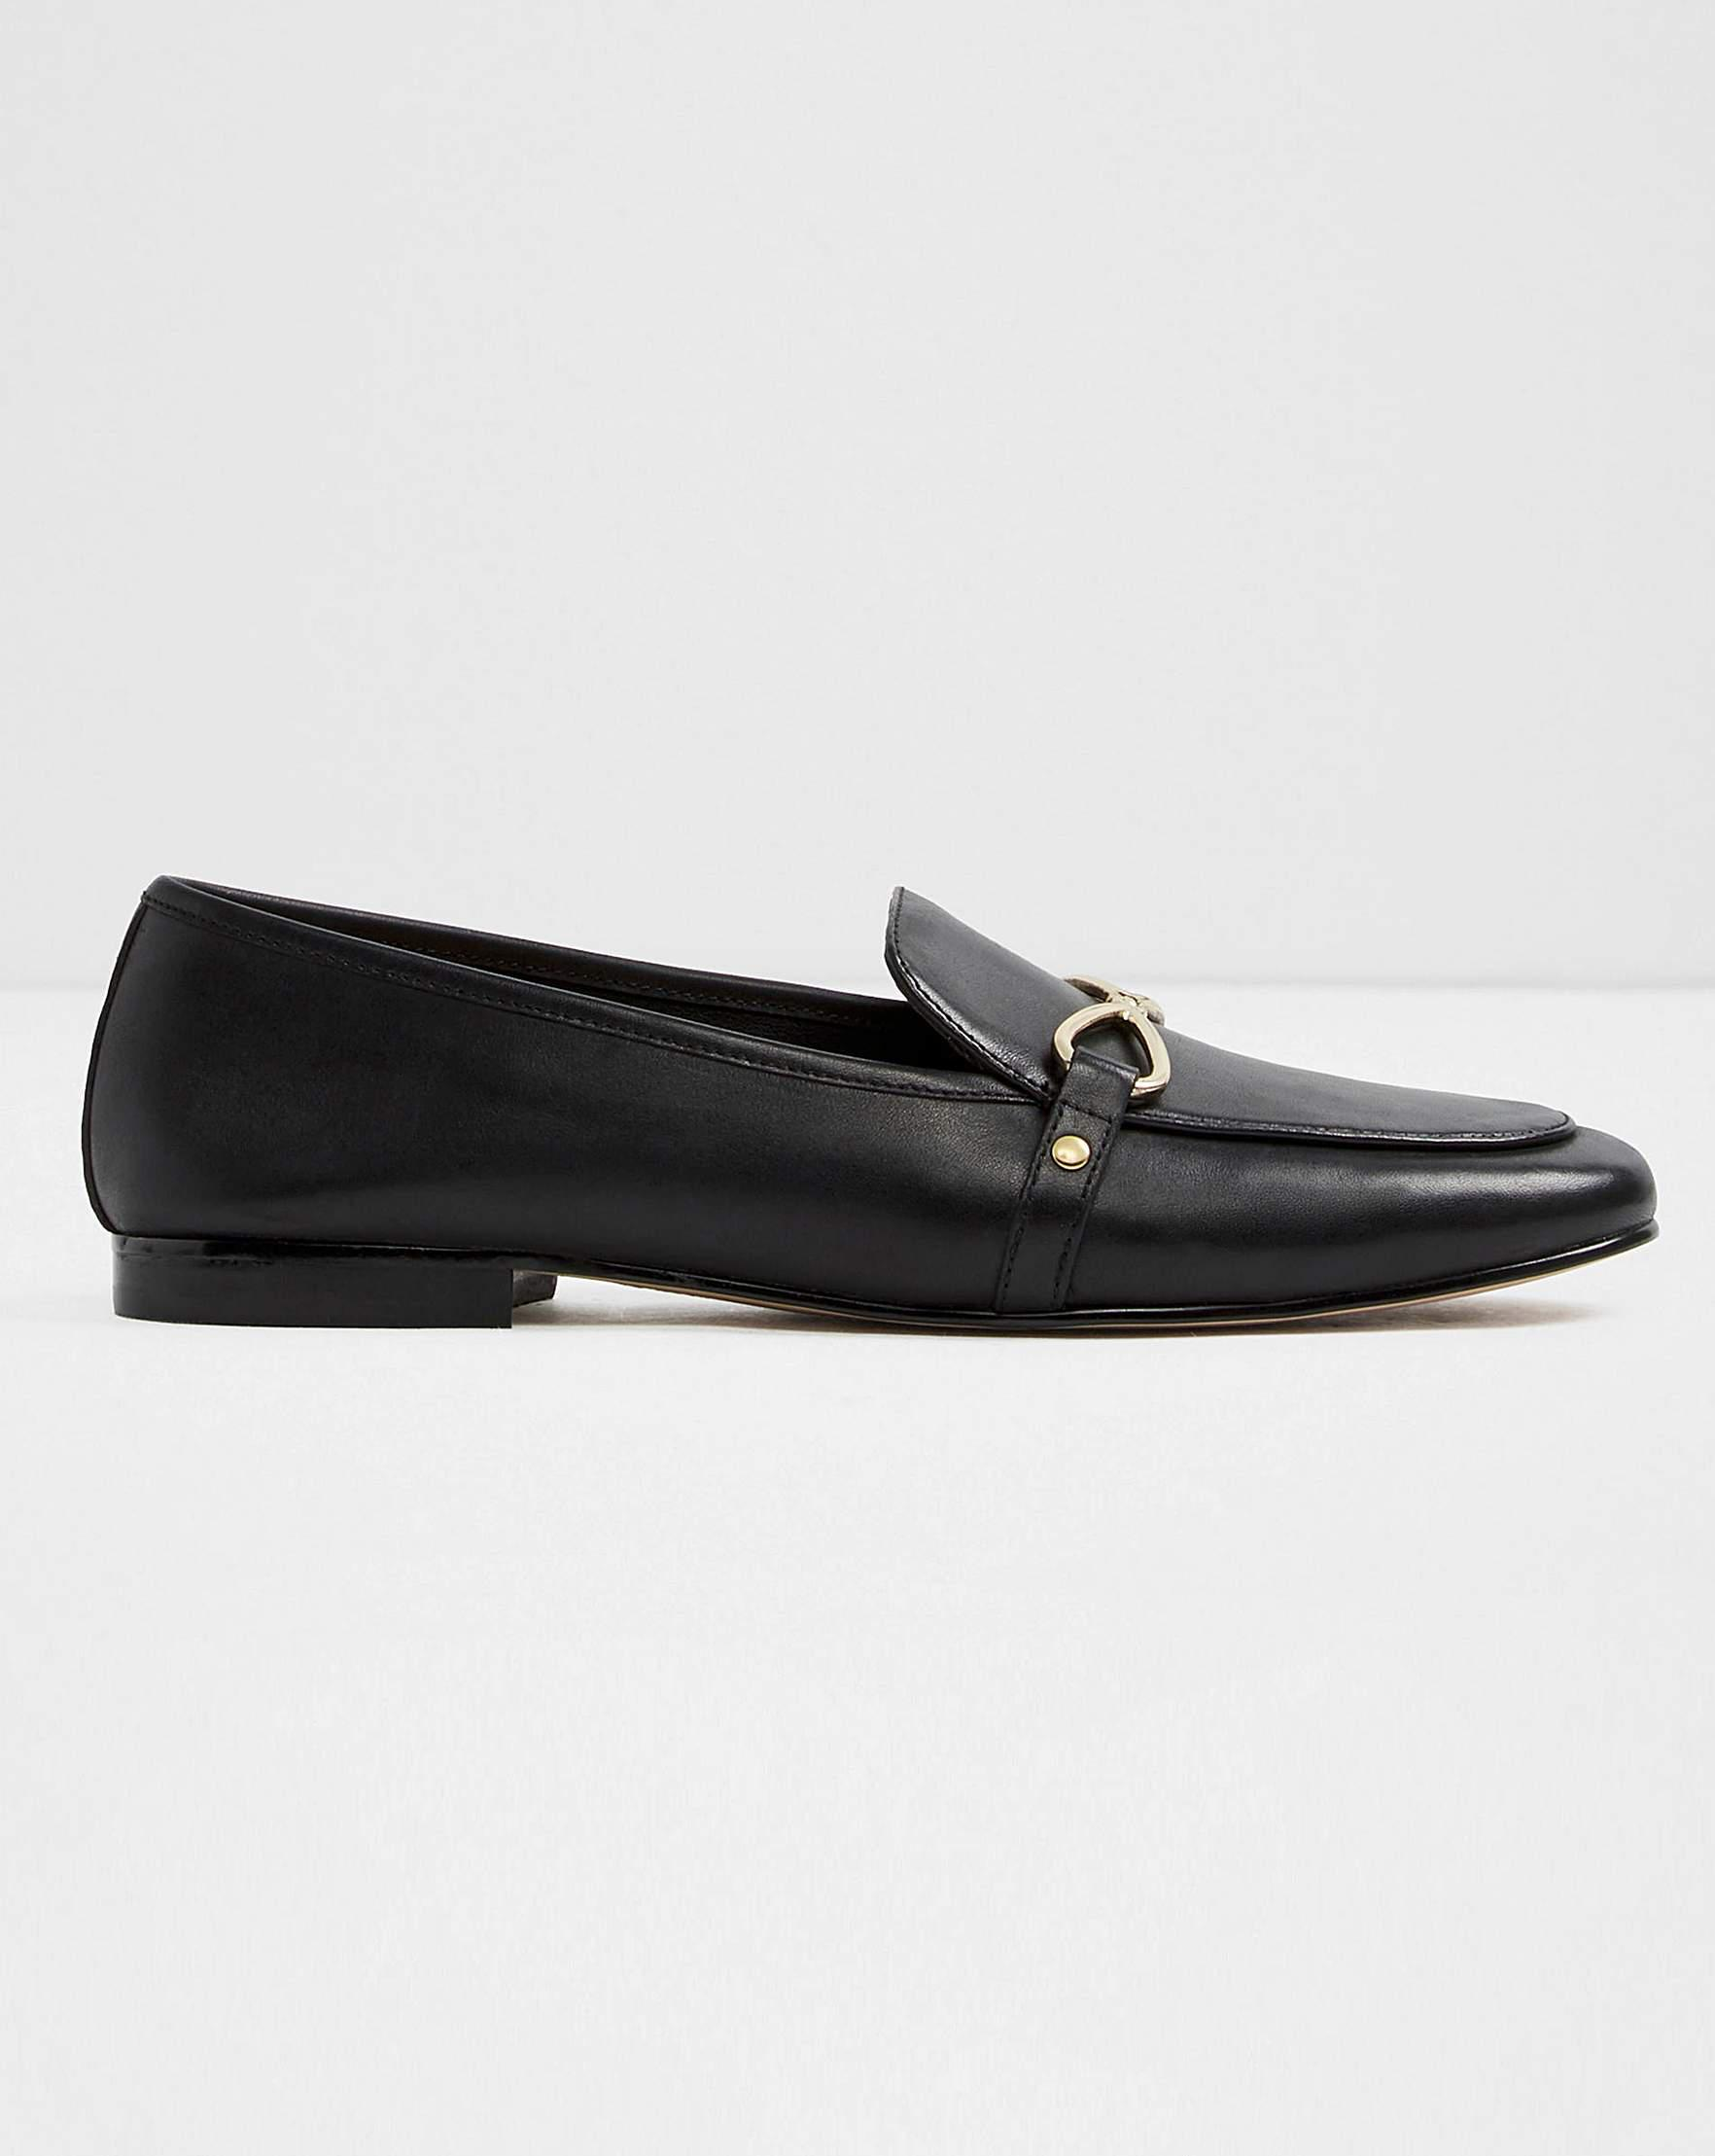 bdd2ca84aff ALDO Afaucia Leather Loafer Standard Fit in Black - Lyst